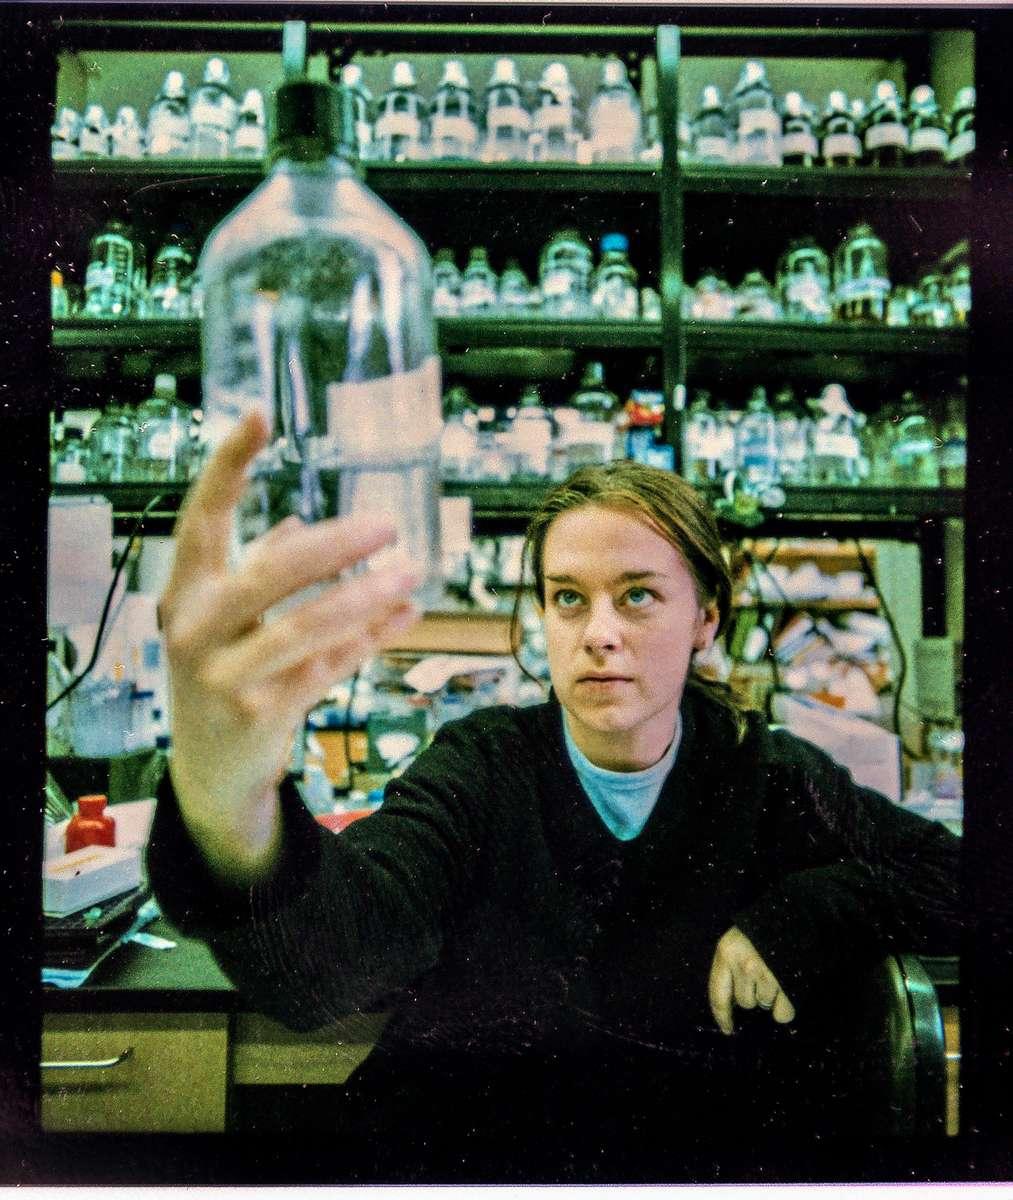 assistant_polaroid-anna-amelia-polaroid--frank_veronsky_frank_veronsky